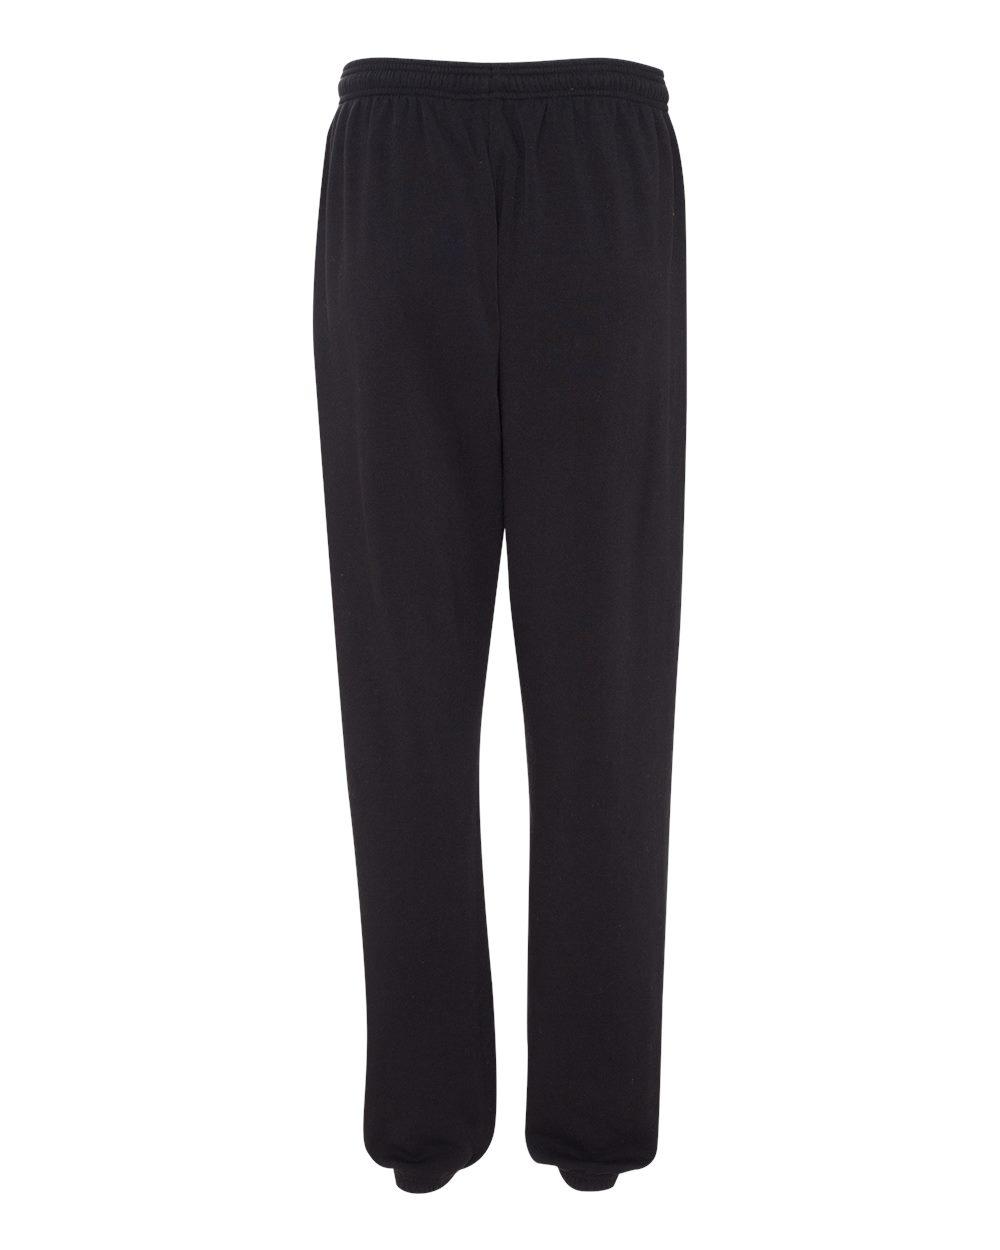 Bella-Canvas-Unisex-Long-Scrunch-Fleece-Pants-Workout-3737-up-to-2XL thumbnail 7